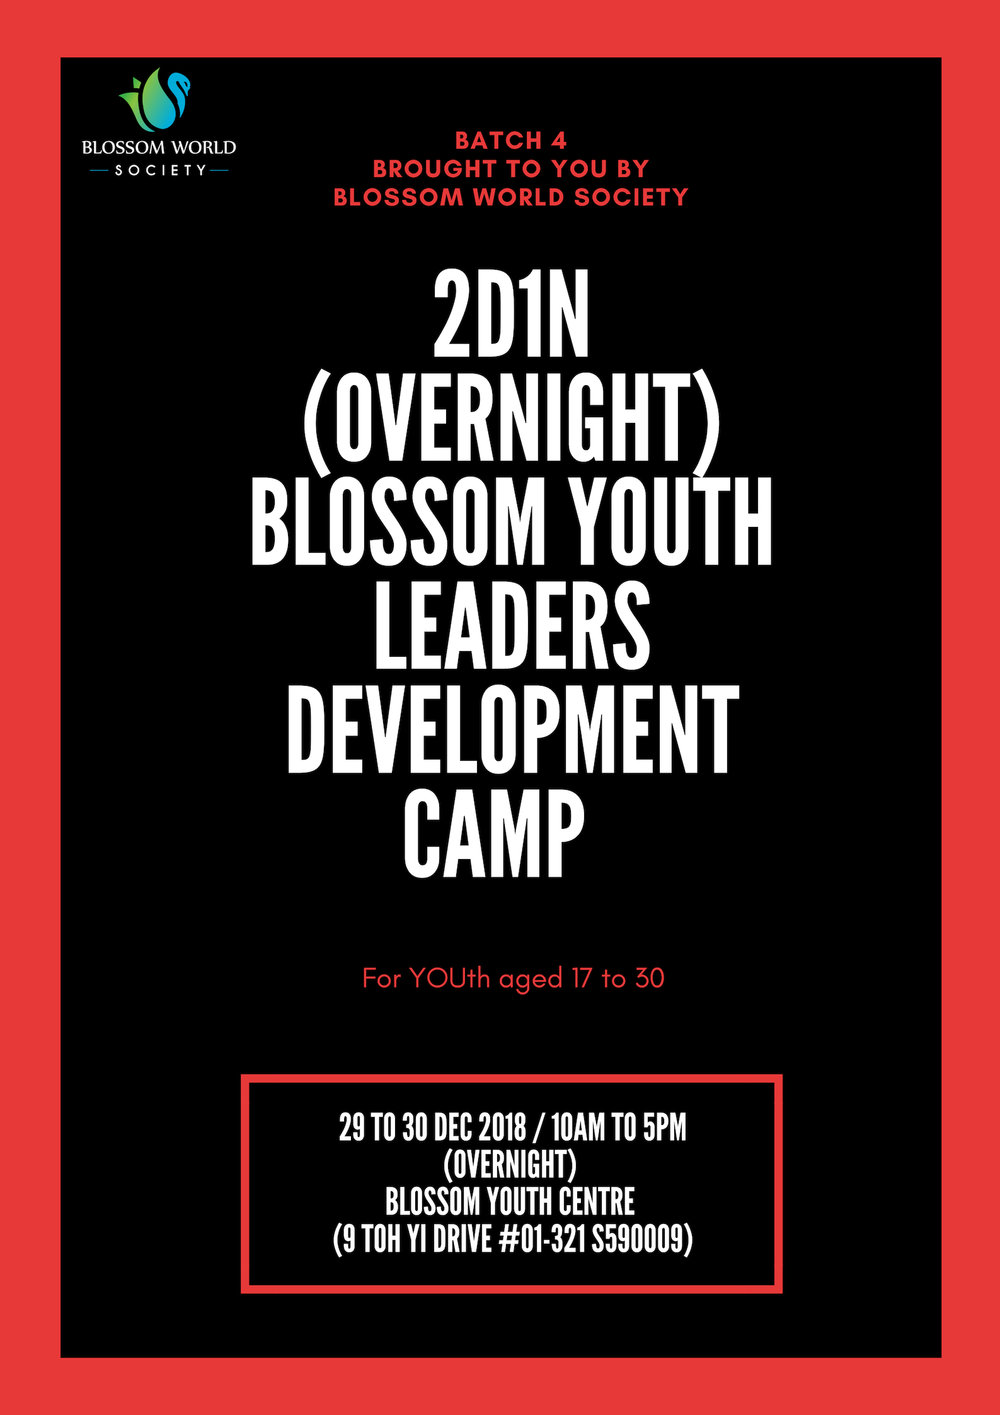 B4 BYDP Camp poster.jpg